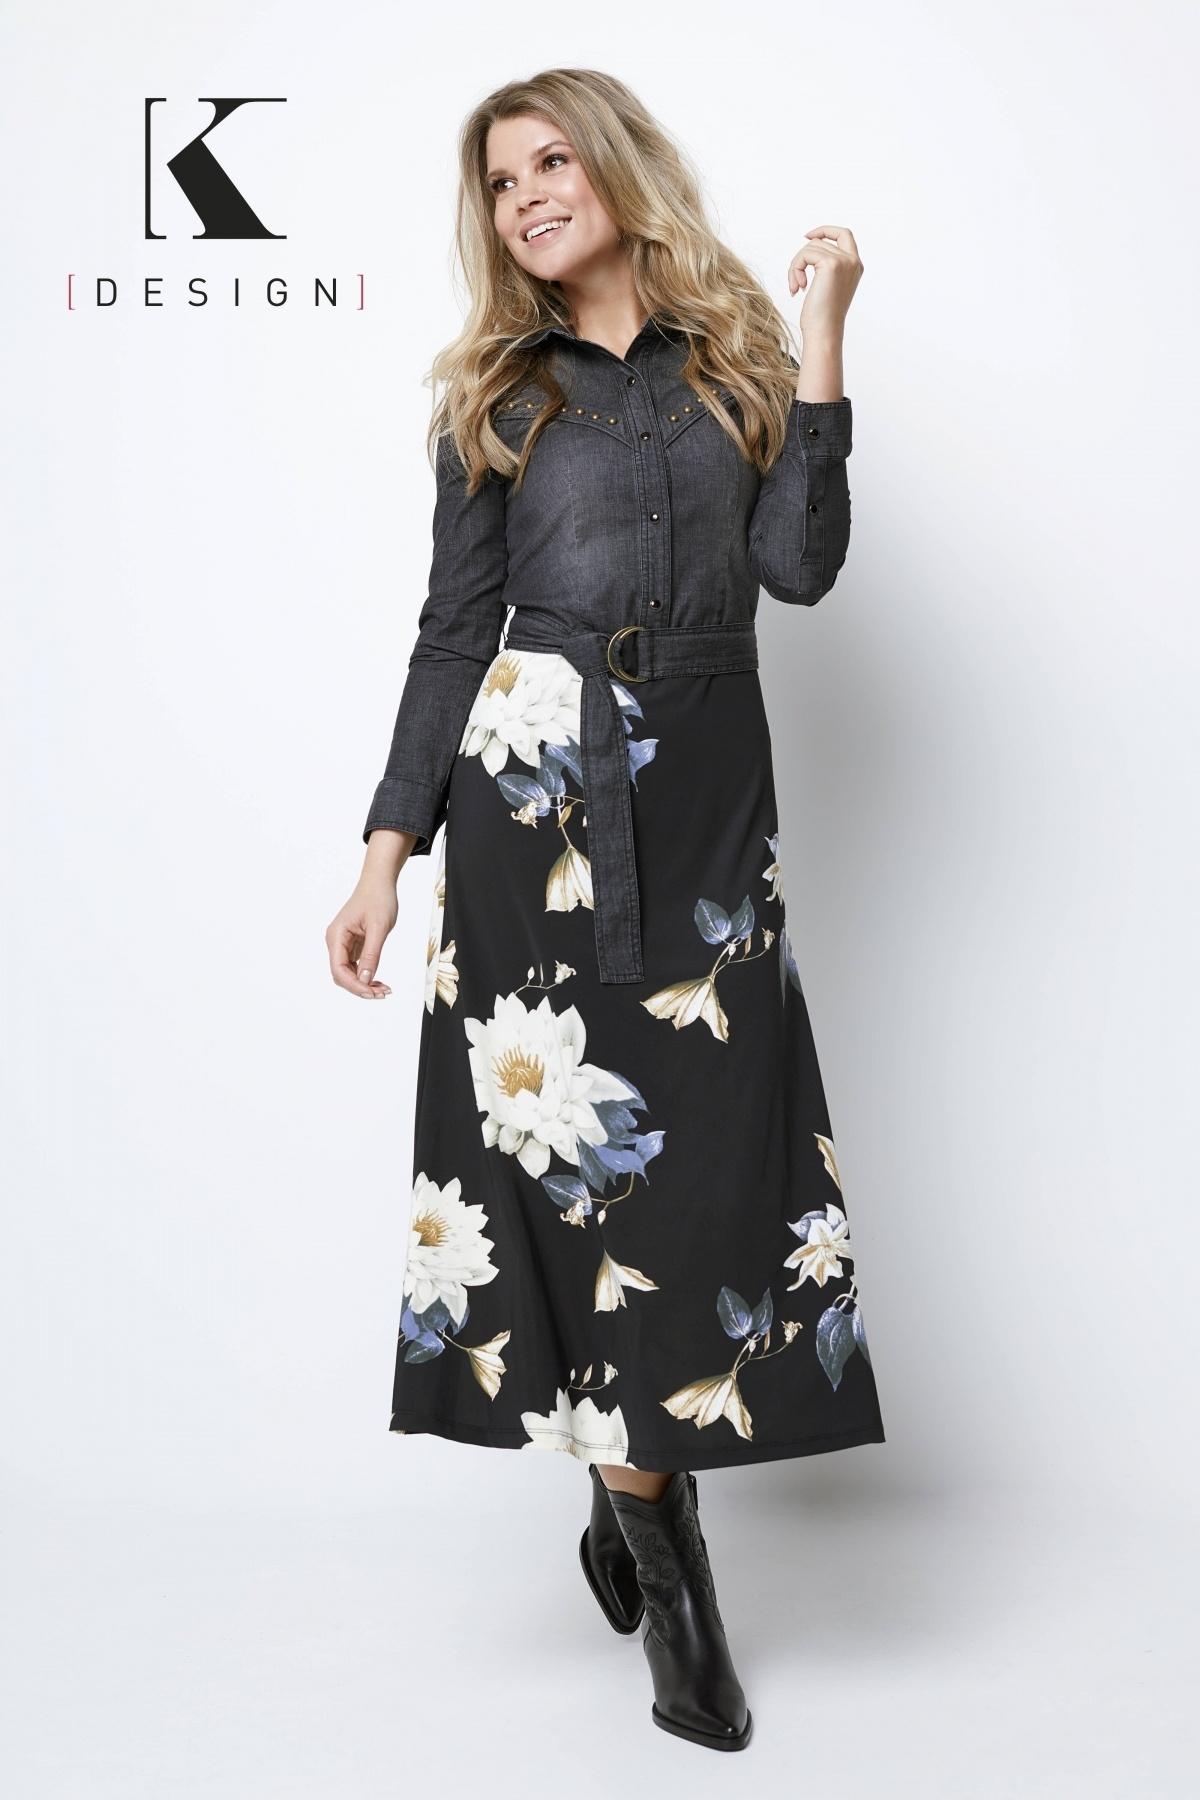 K-Design K-Design maxi jurk met jeans, riem & print